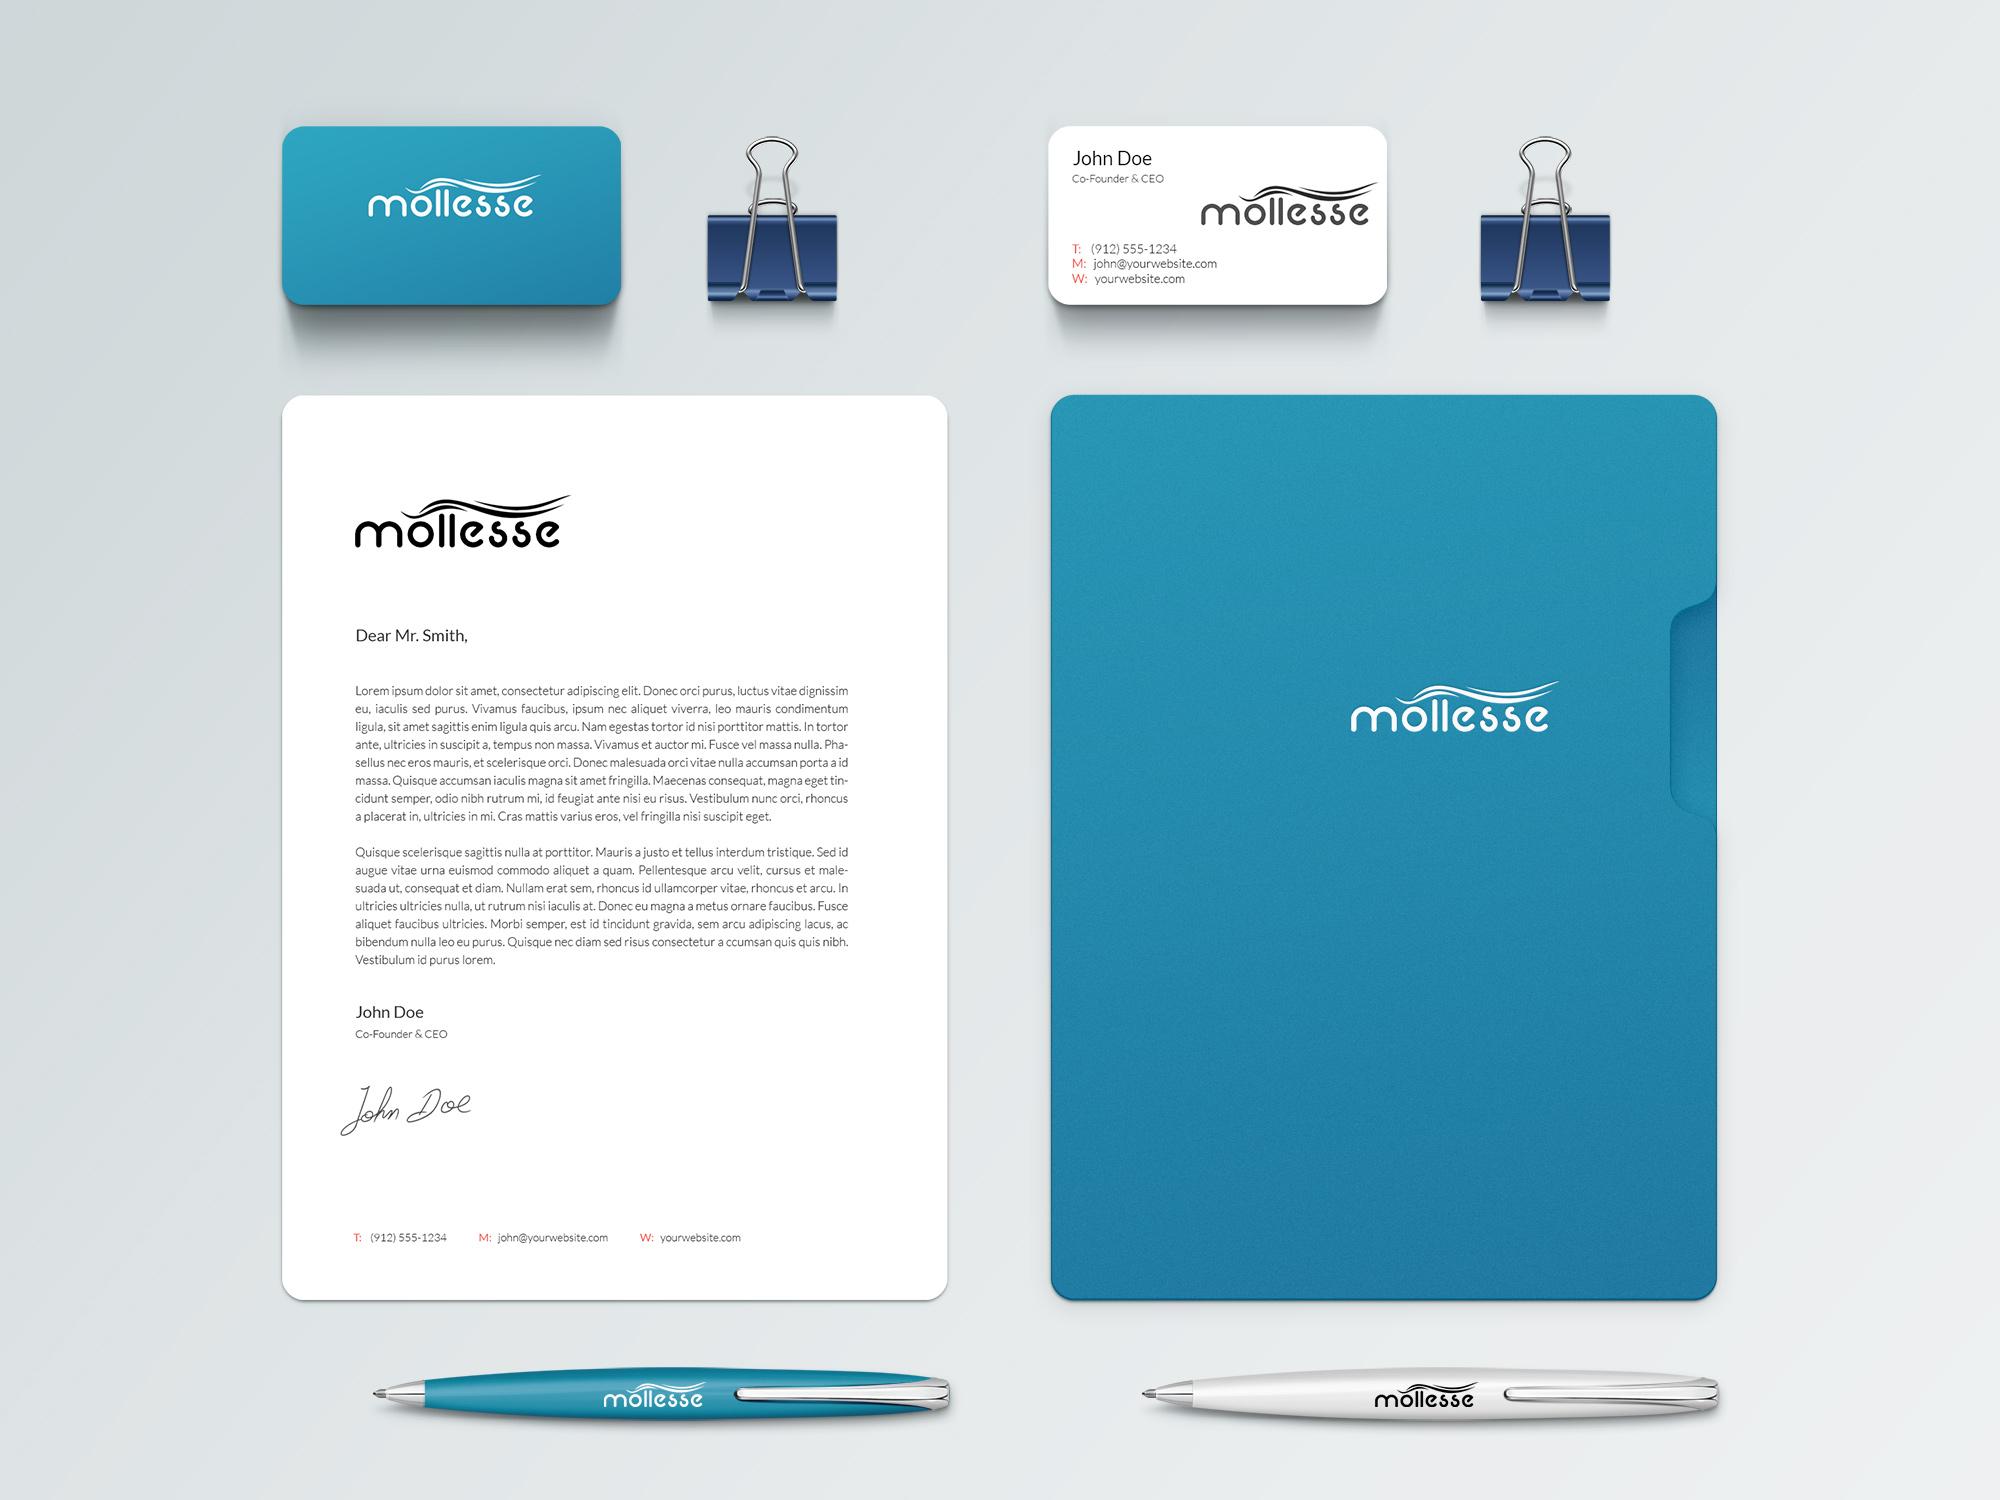 mollesse-branding-identity